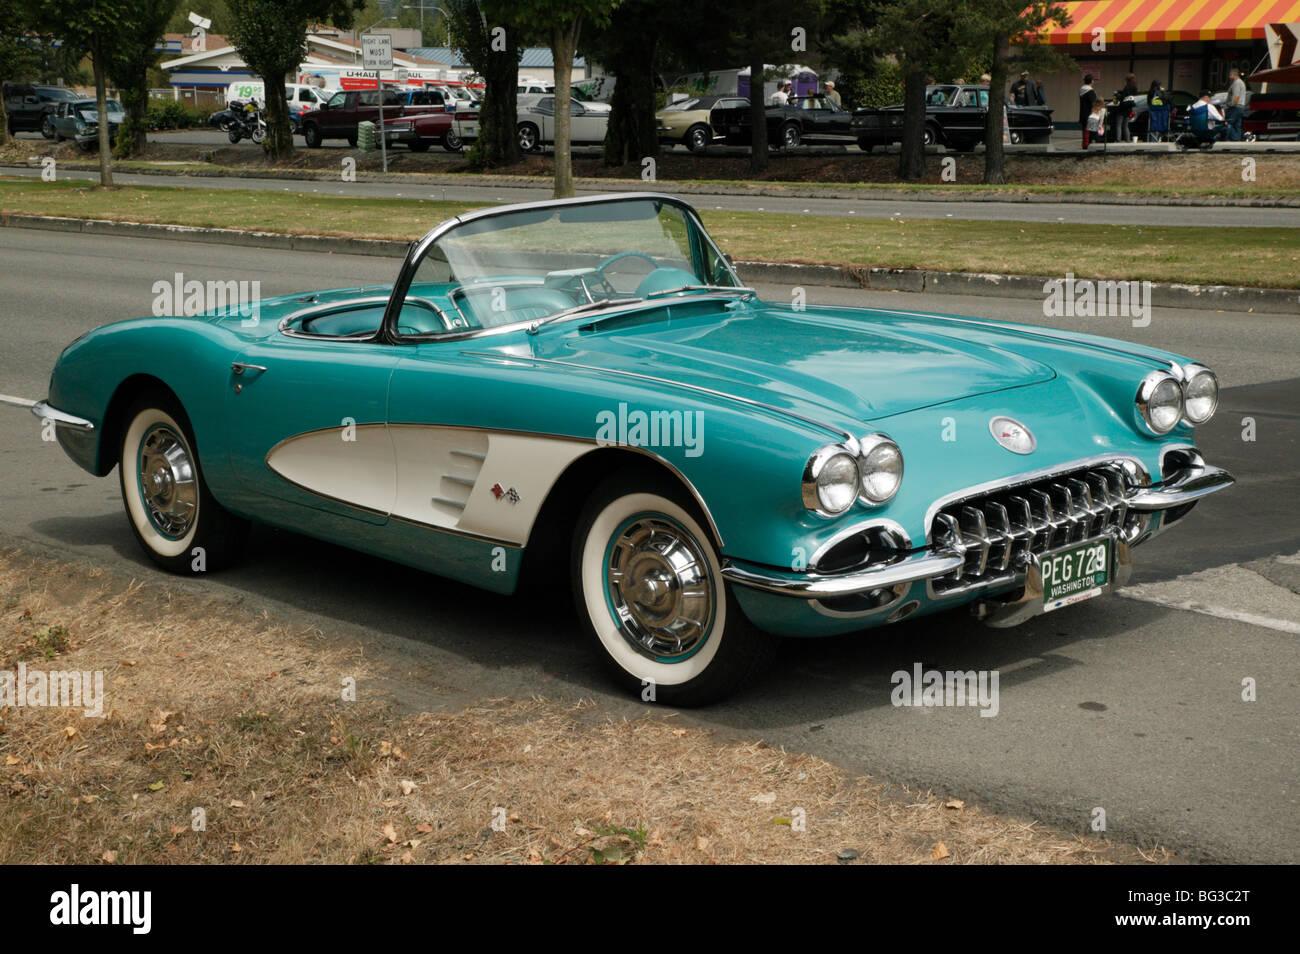 A 1950 S Chevrolet Corvette Convertible Roadster On Show